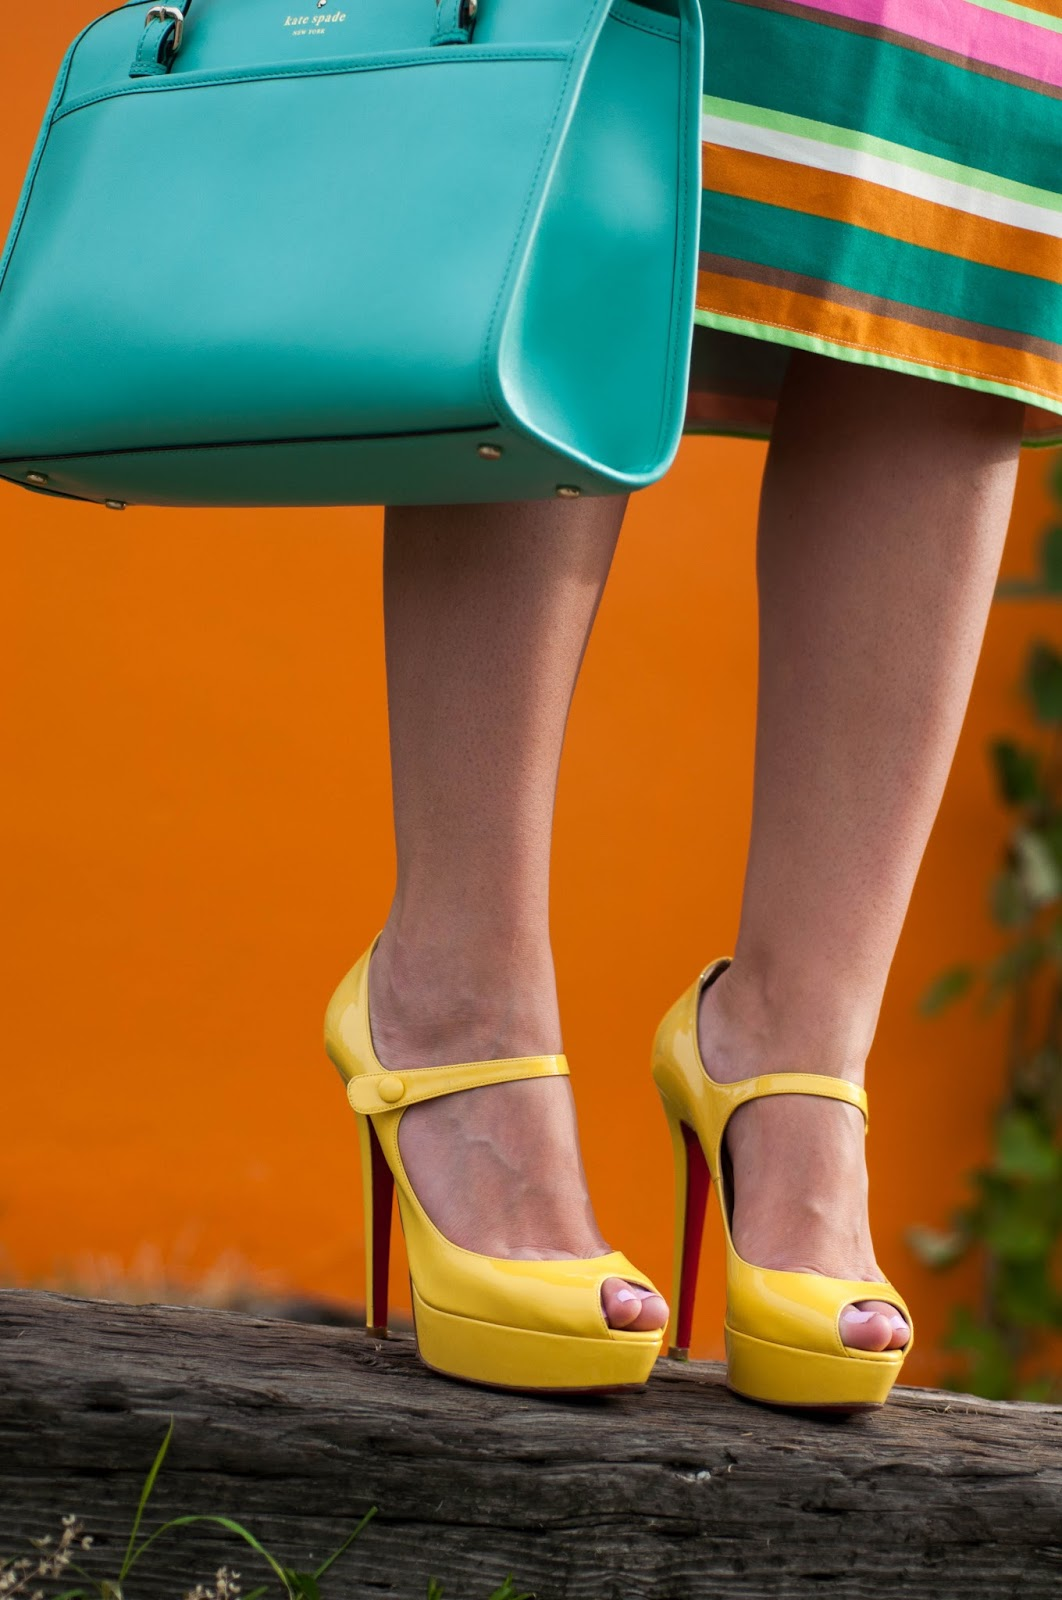 red soles, christian louboutin, yellow heels, kate spade handbag, striped skirt, pencil skirt